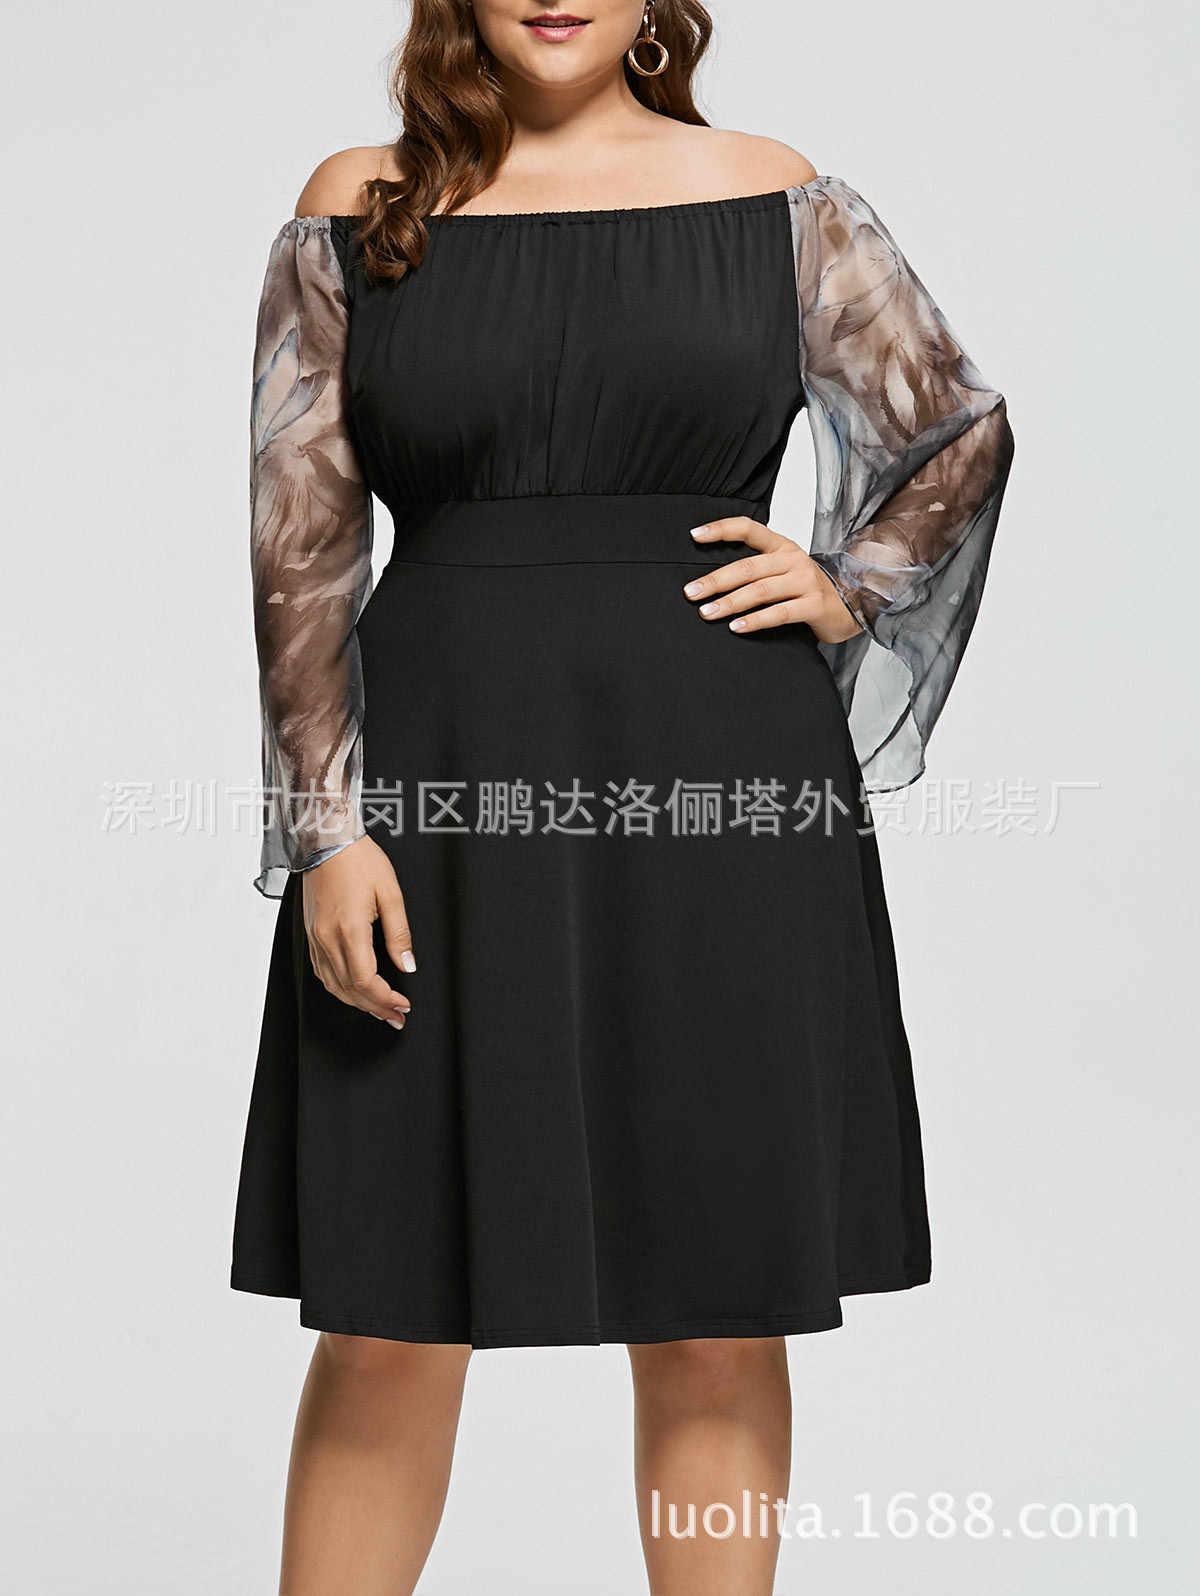 Long Sleeve Autumn Winter Cocktail Dresses Elegant A-line Chiffon Black  Printed Knee Length Plus 97086a8f3b4f